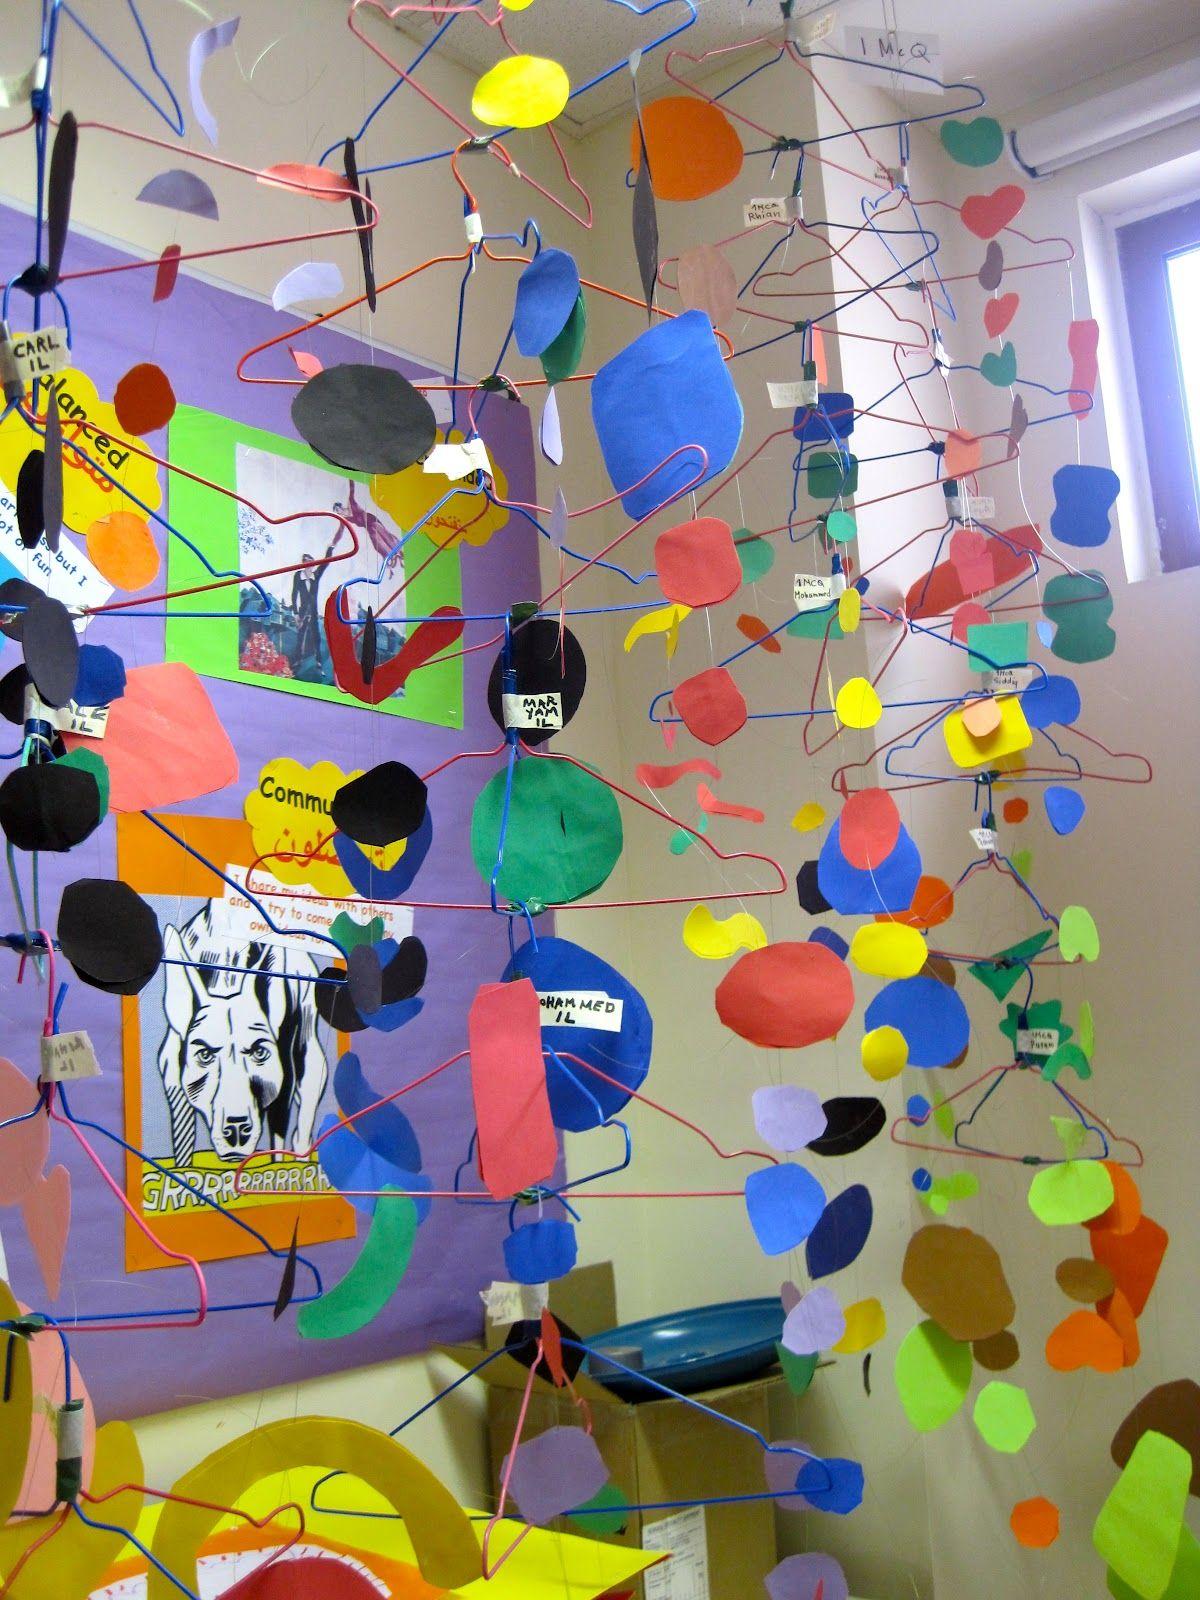 Princess Artypants Sculpture Elementary art